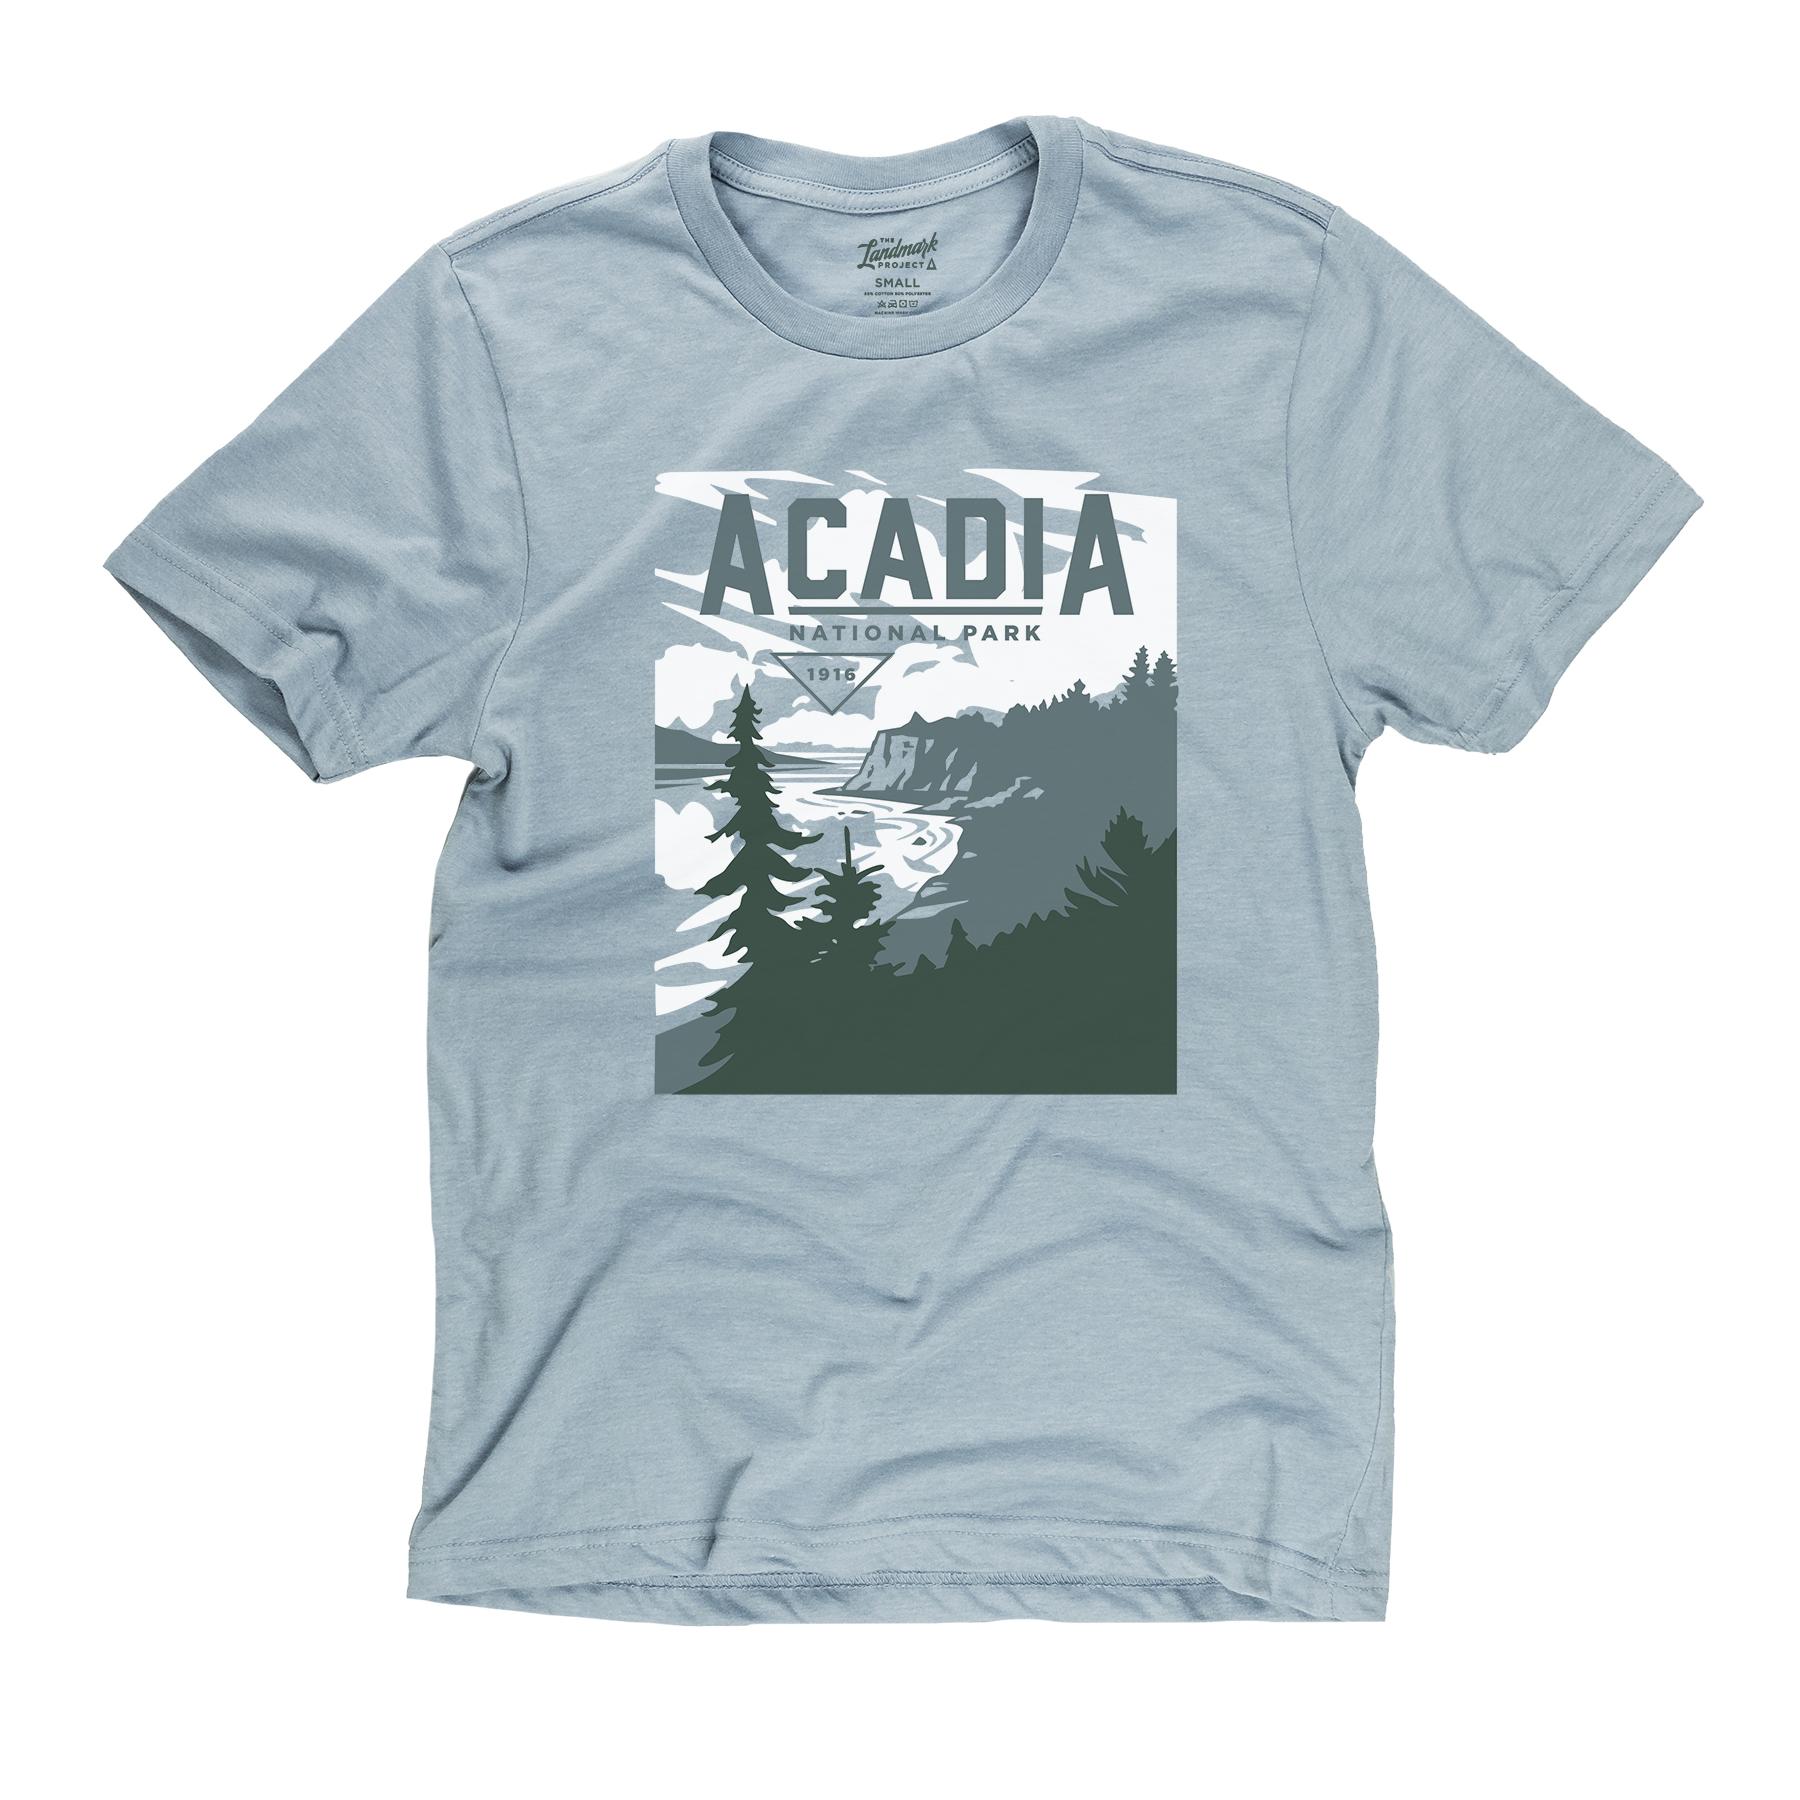 Acadia-chambray-tee.jpg